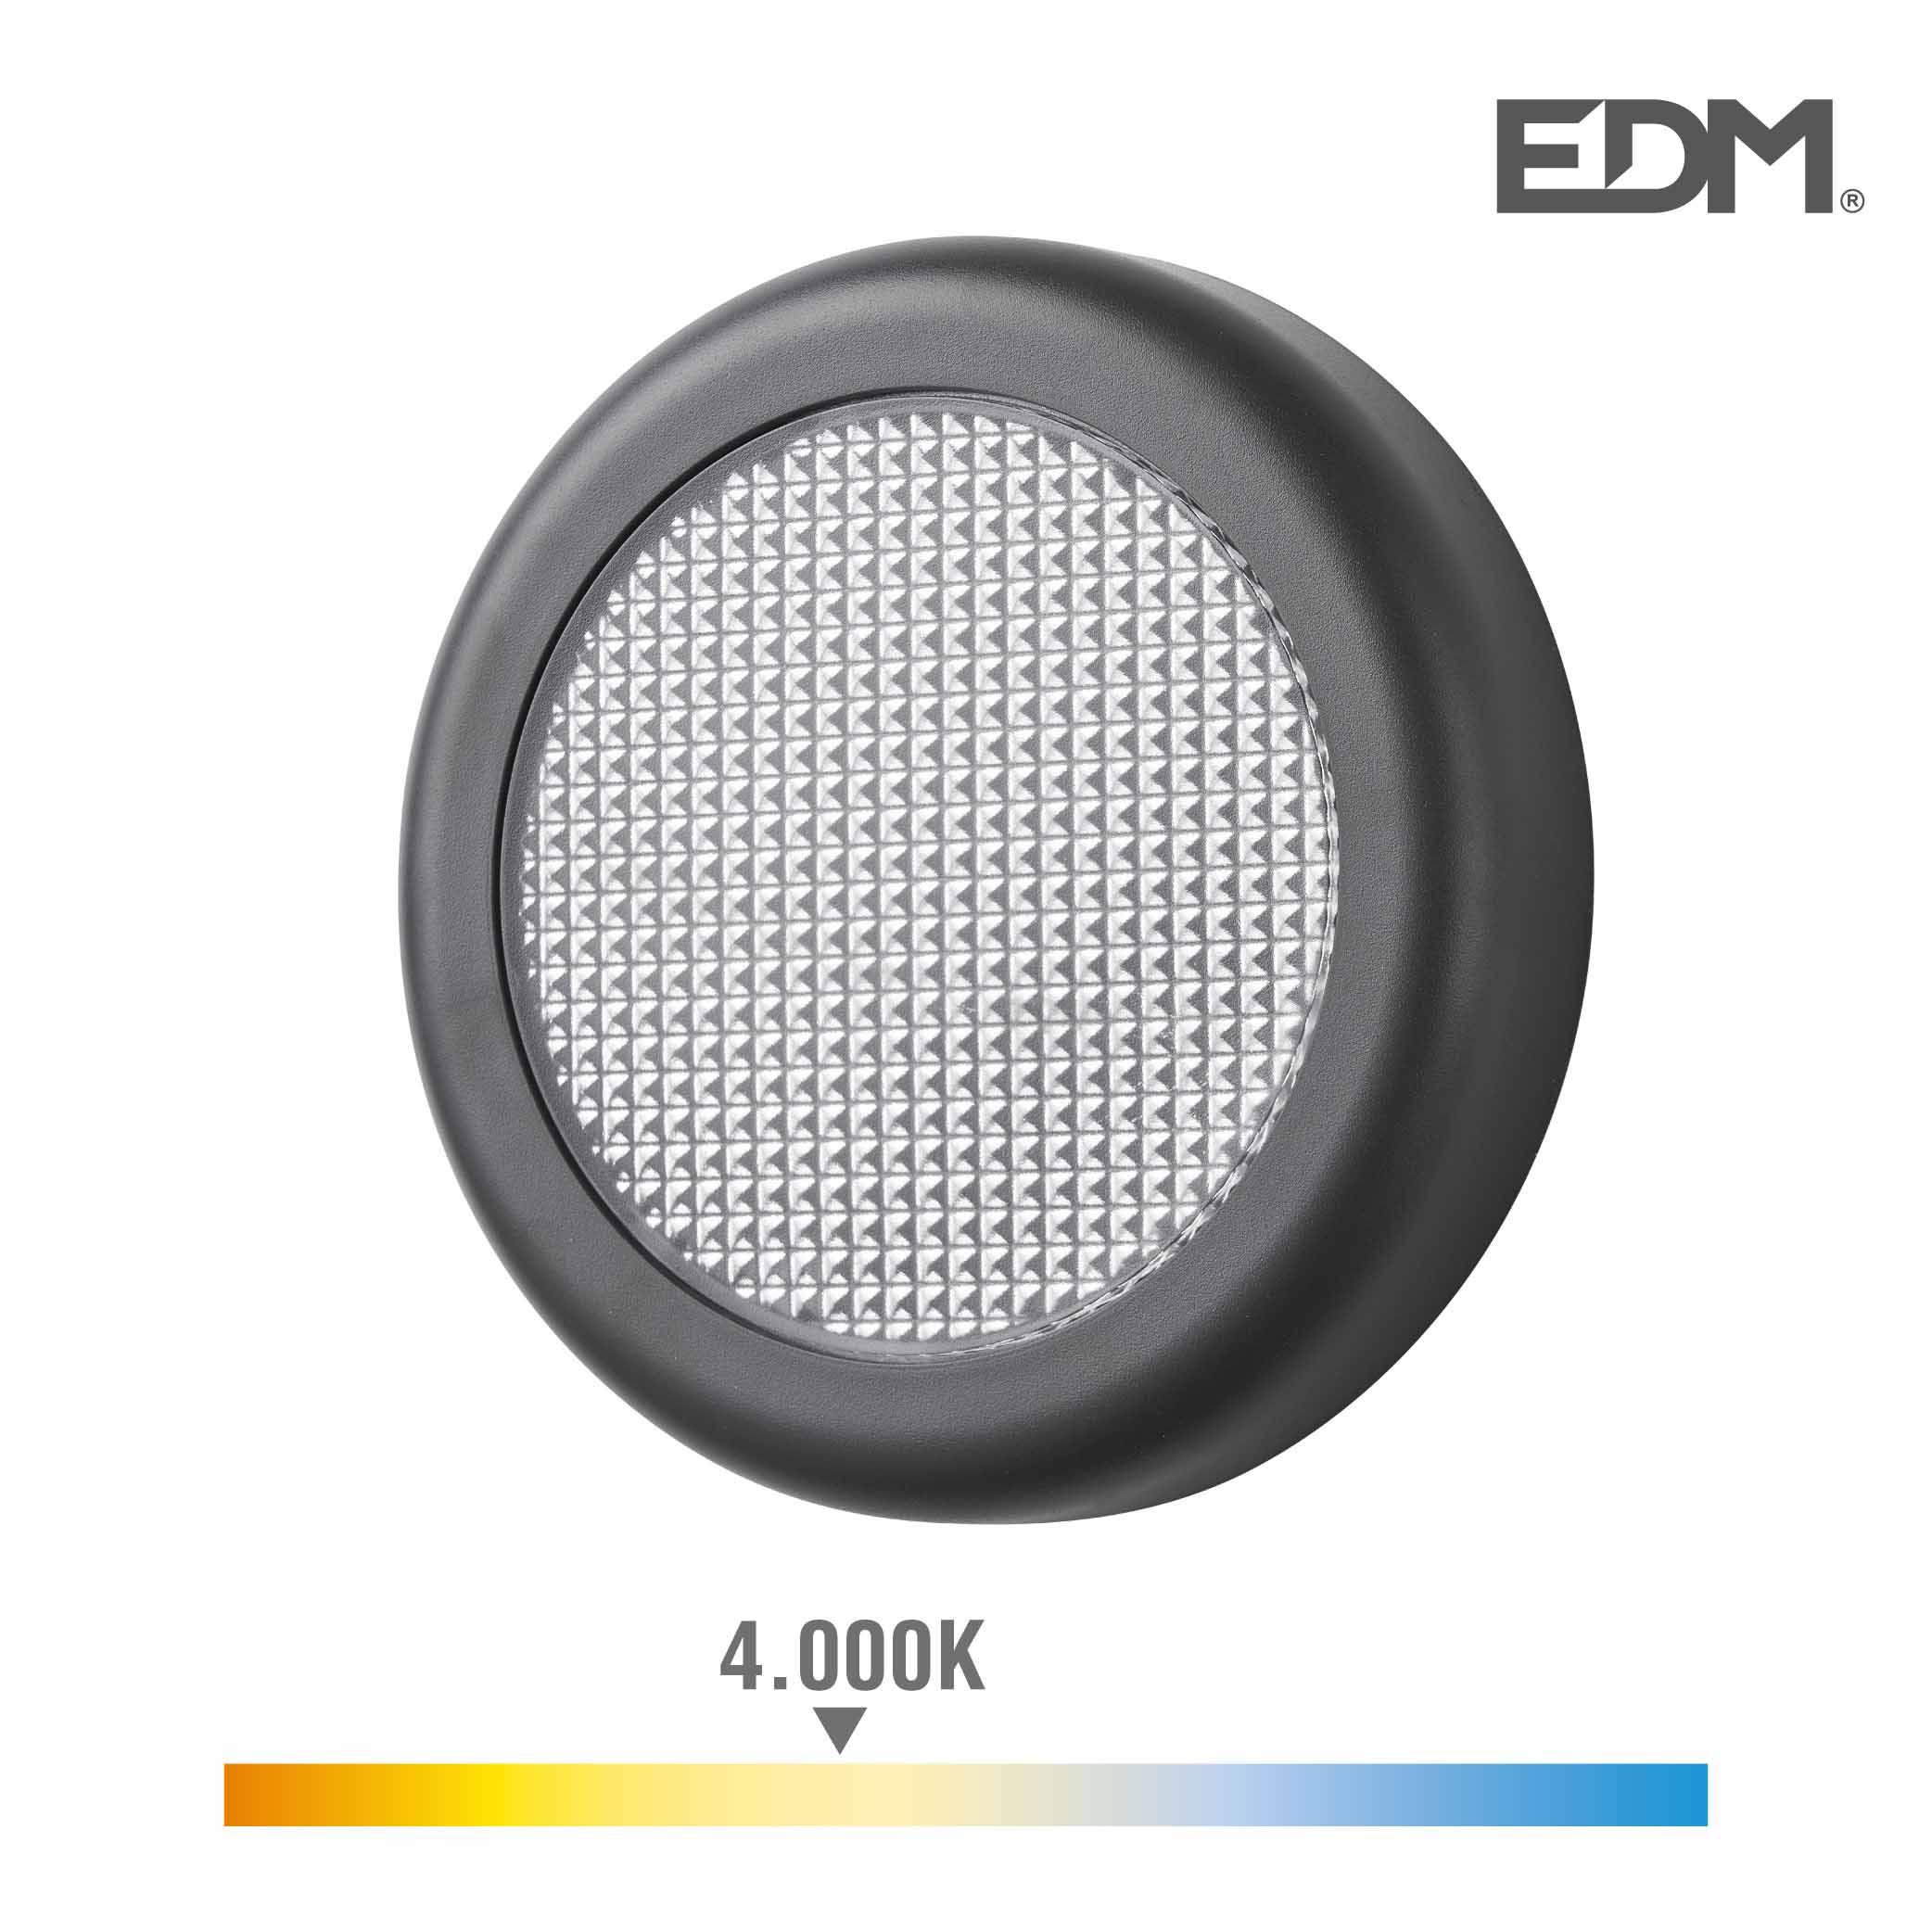 Aplique led 6w 450 lumen 4.000k luz dia ip65 redondo edm